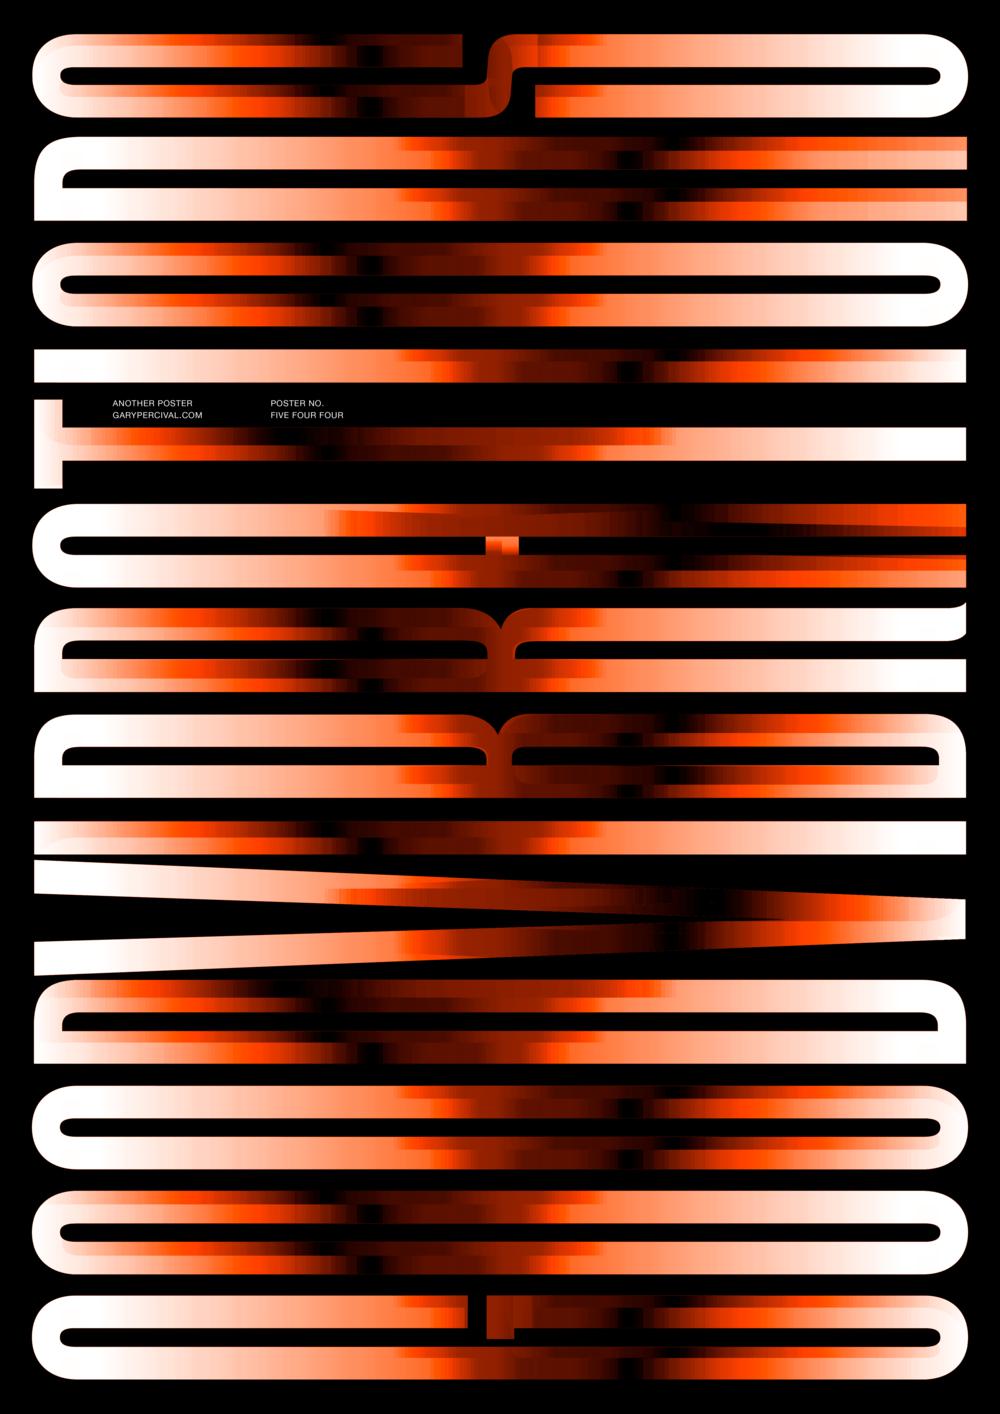 #544_Good Vibrations